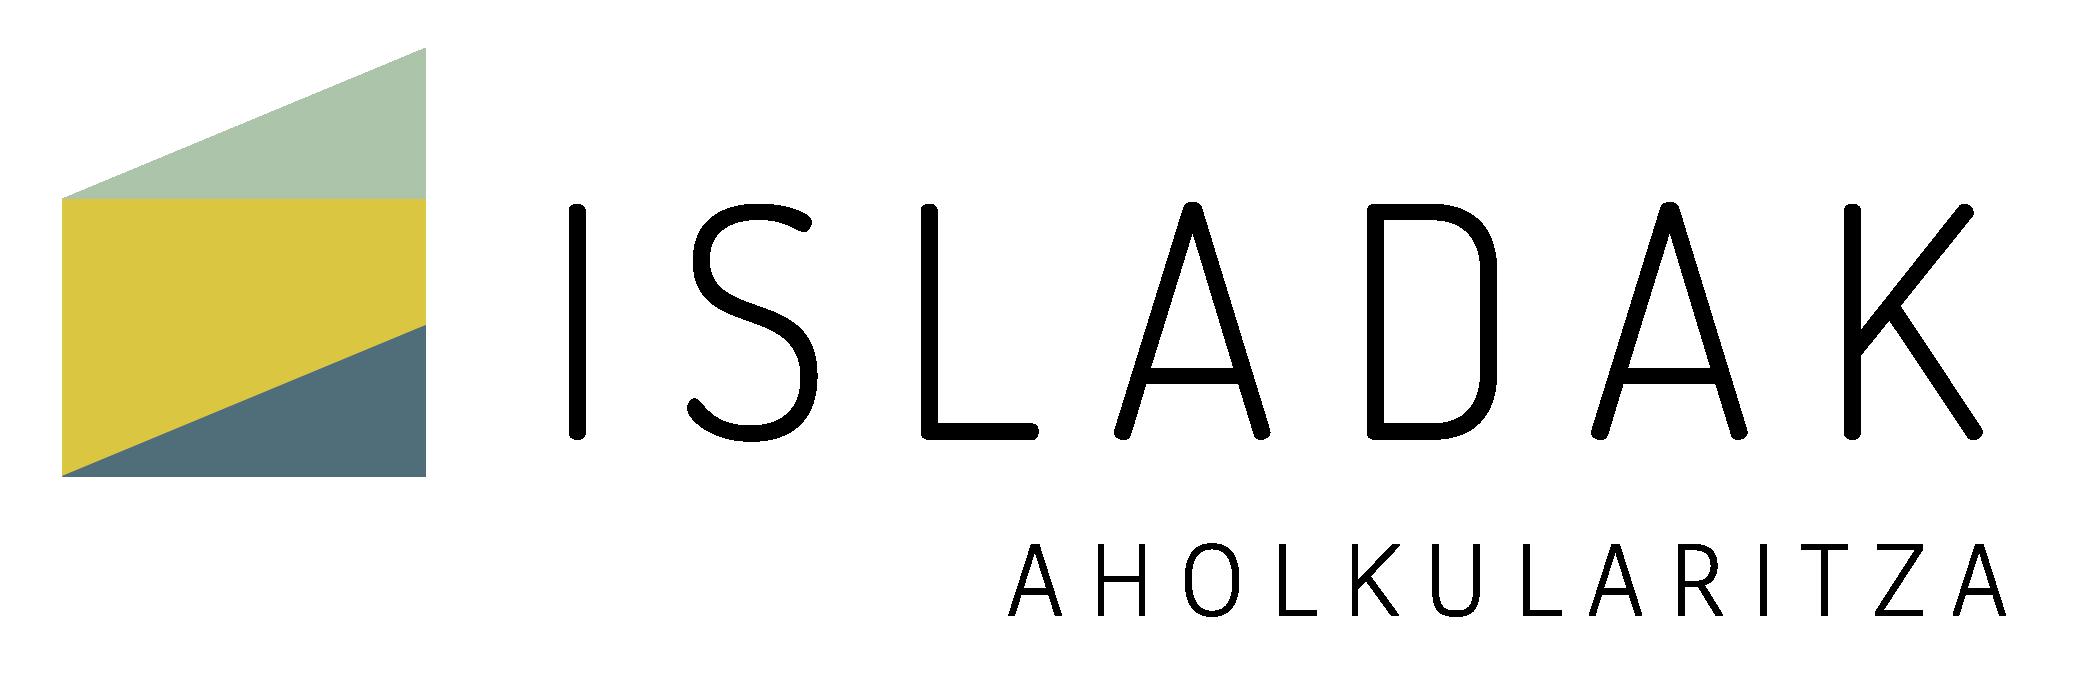 Isladak